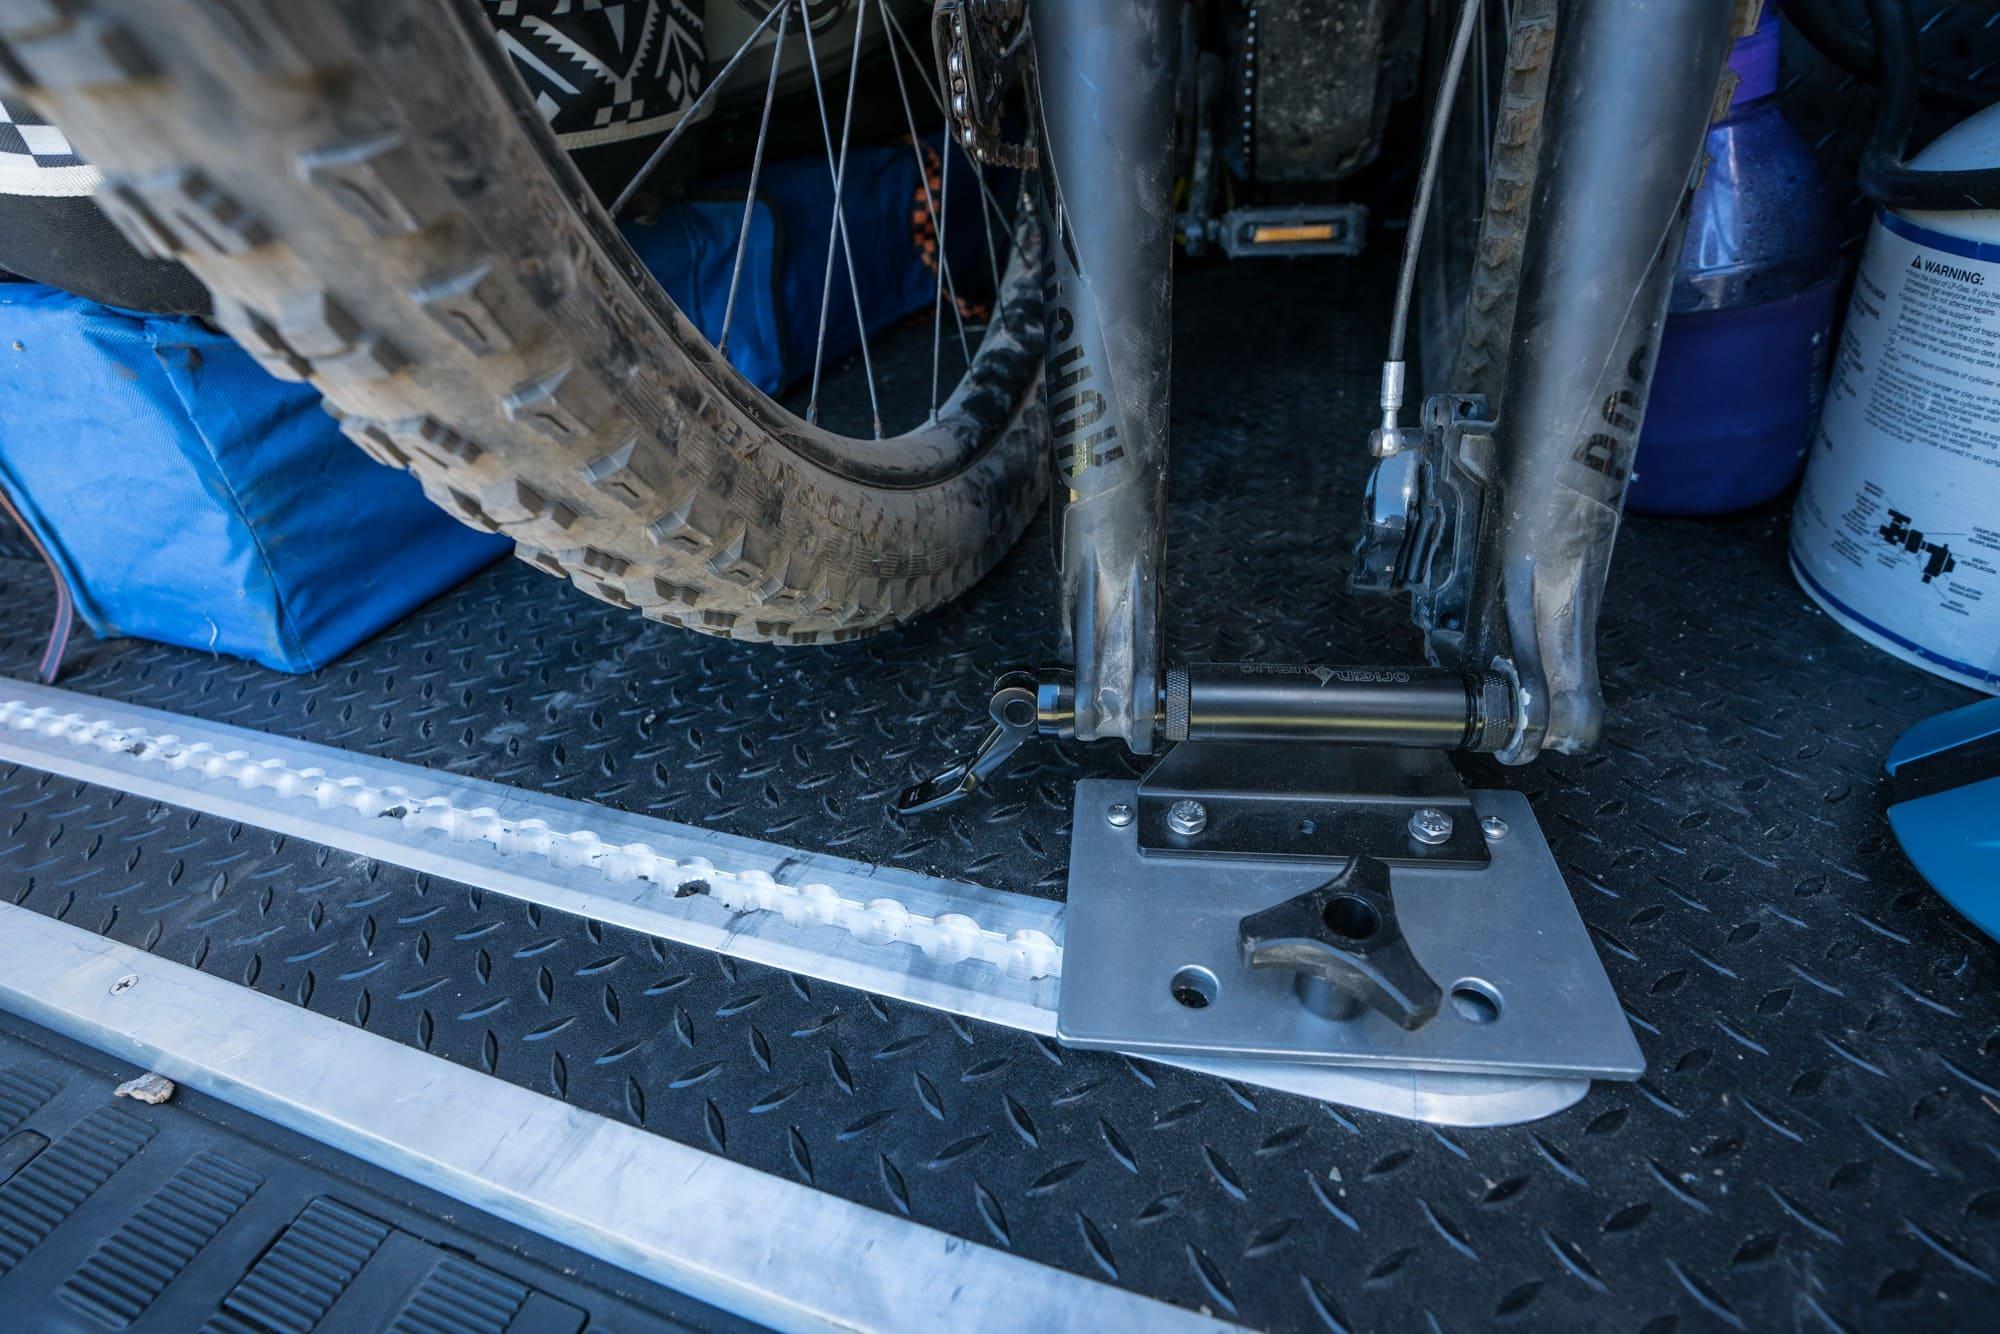 Bike storage in Sprinter Van